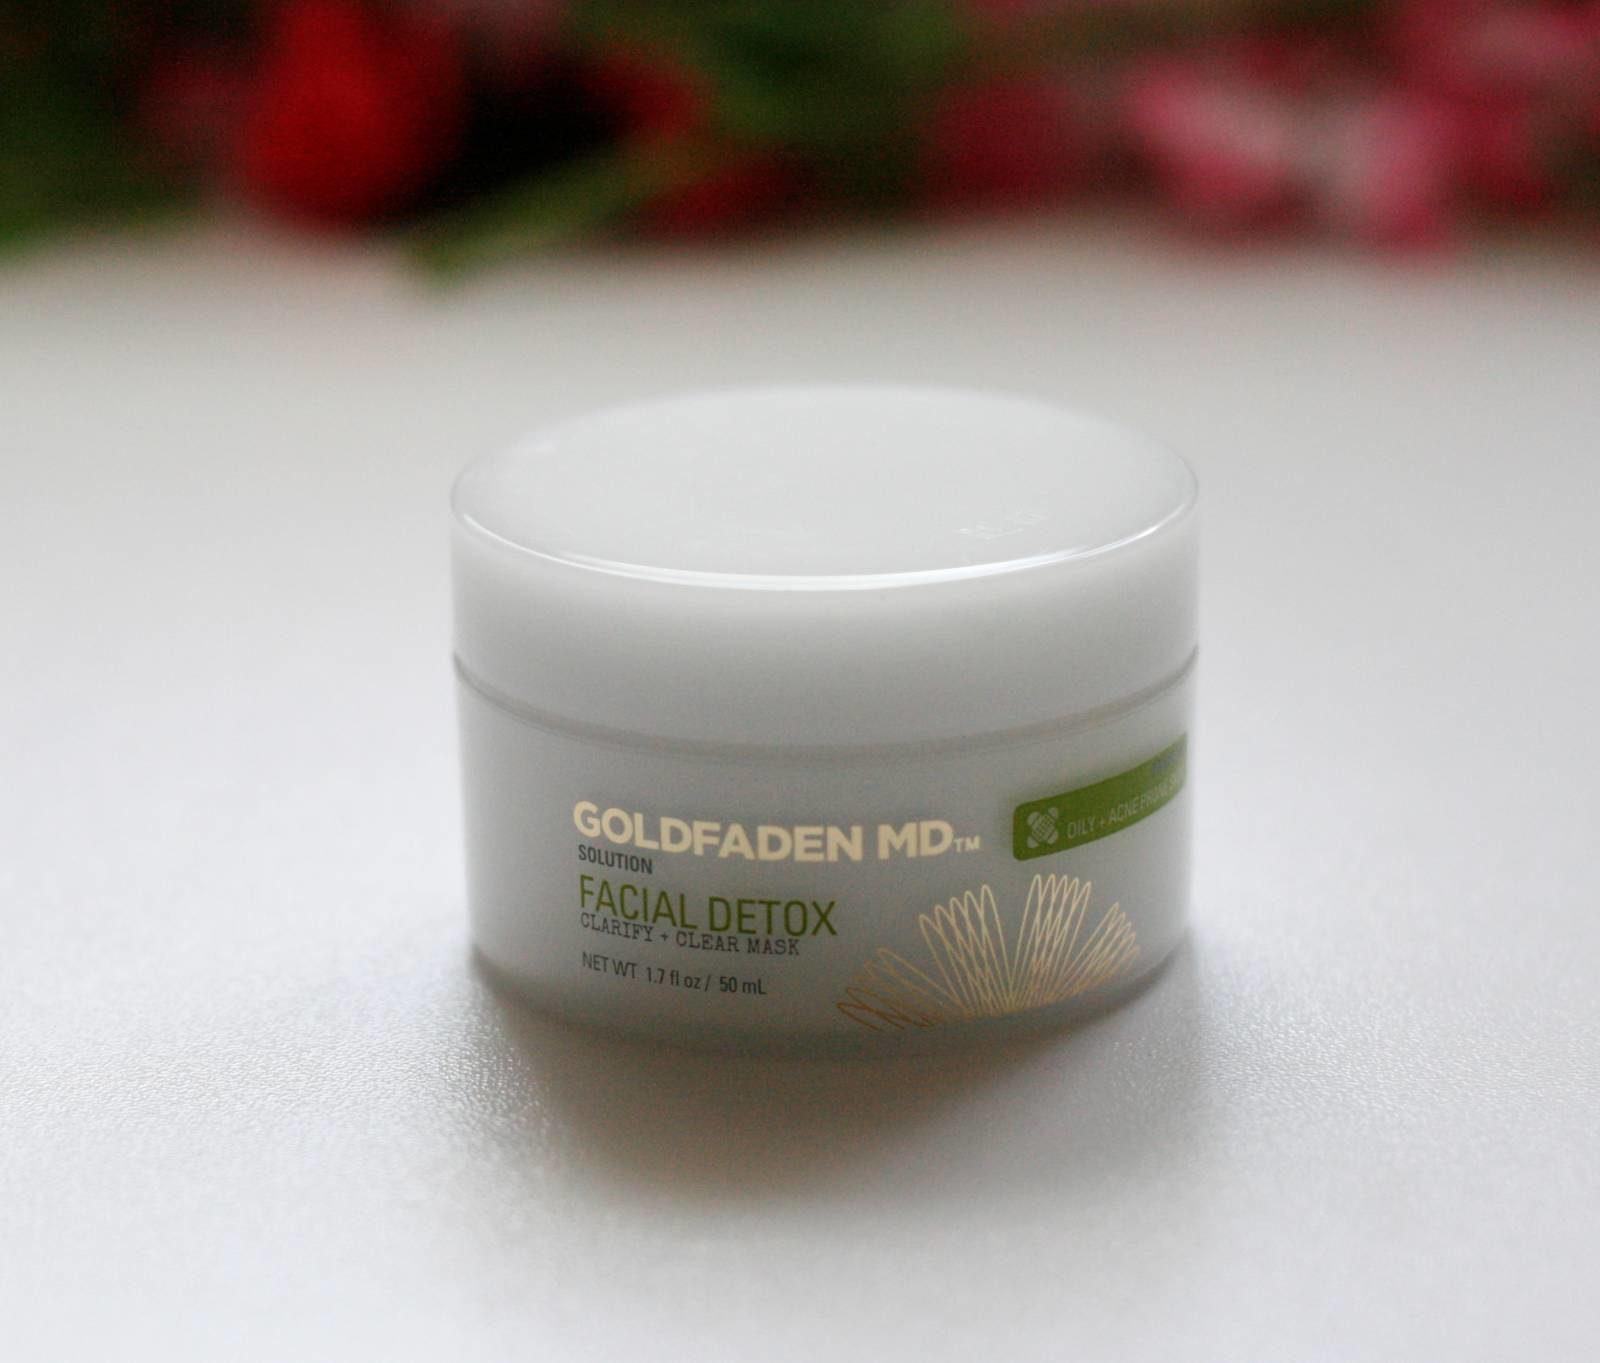 Goldfaden Facial Detox Clarify + Clear Mask Review